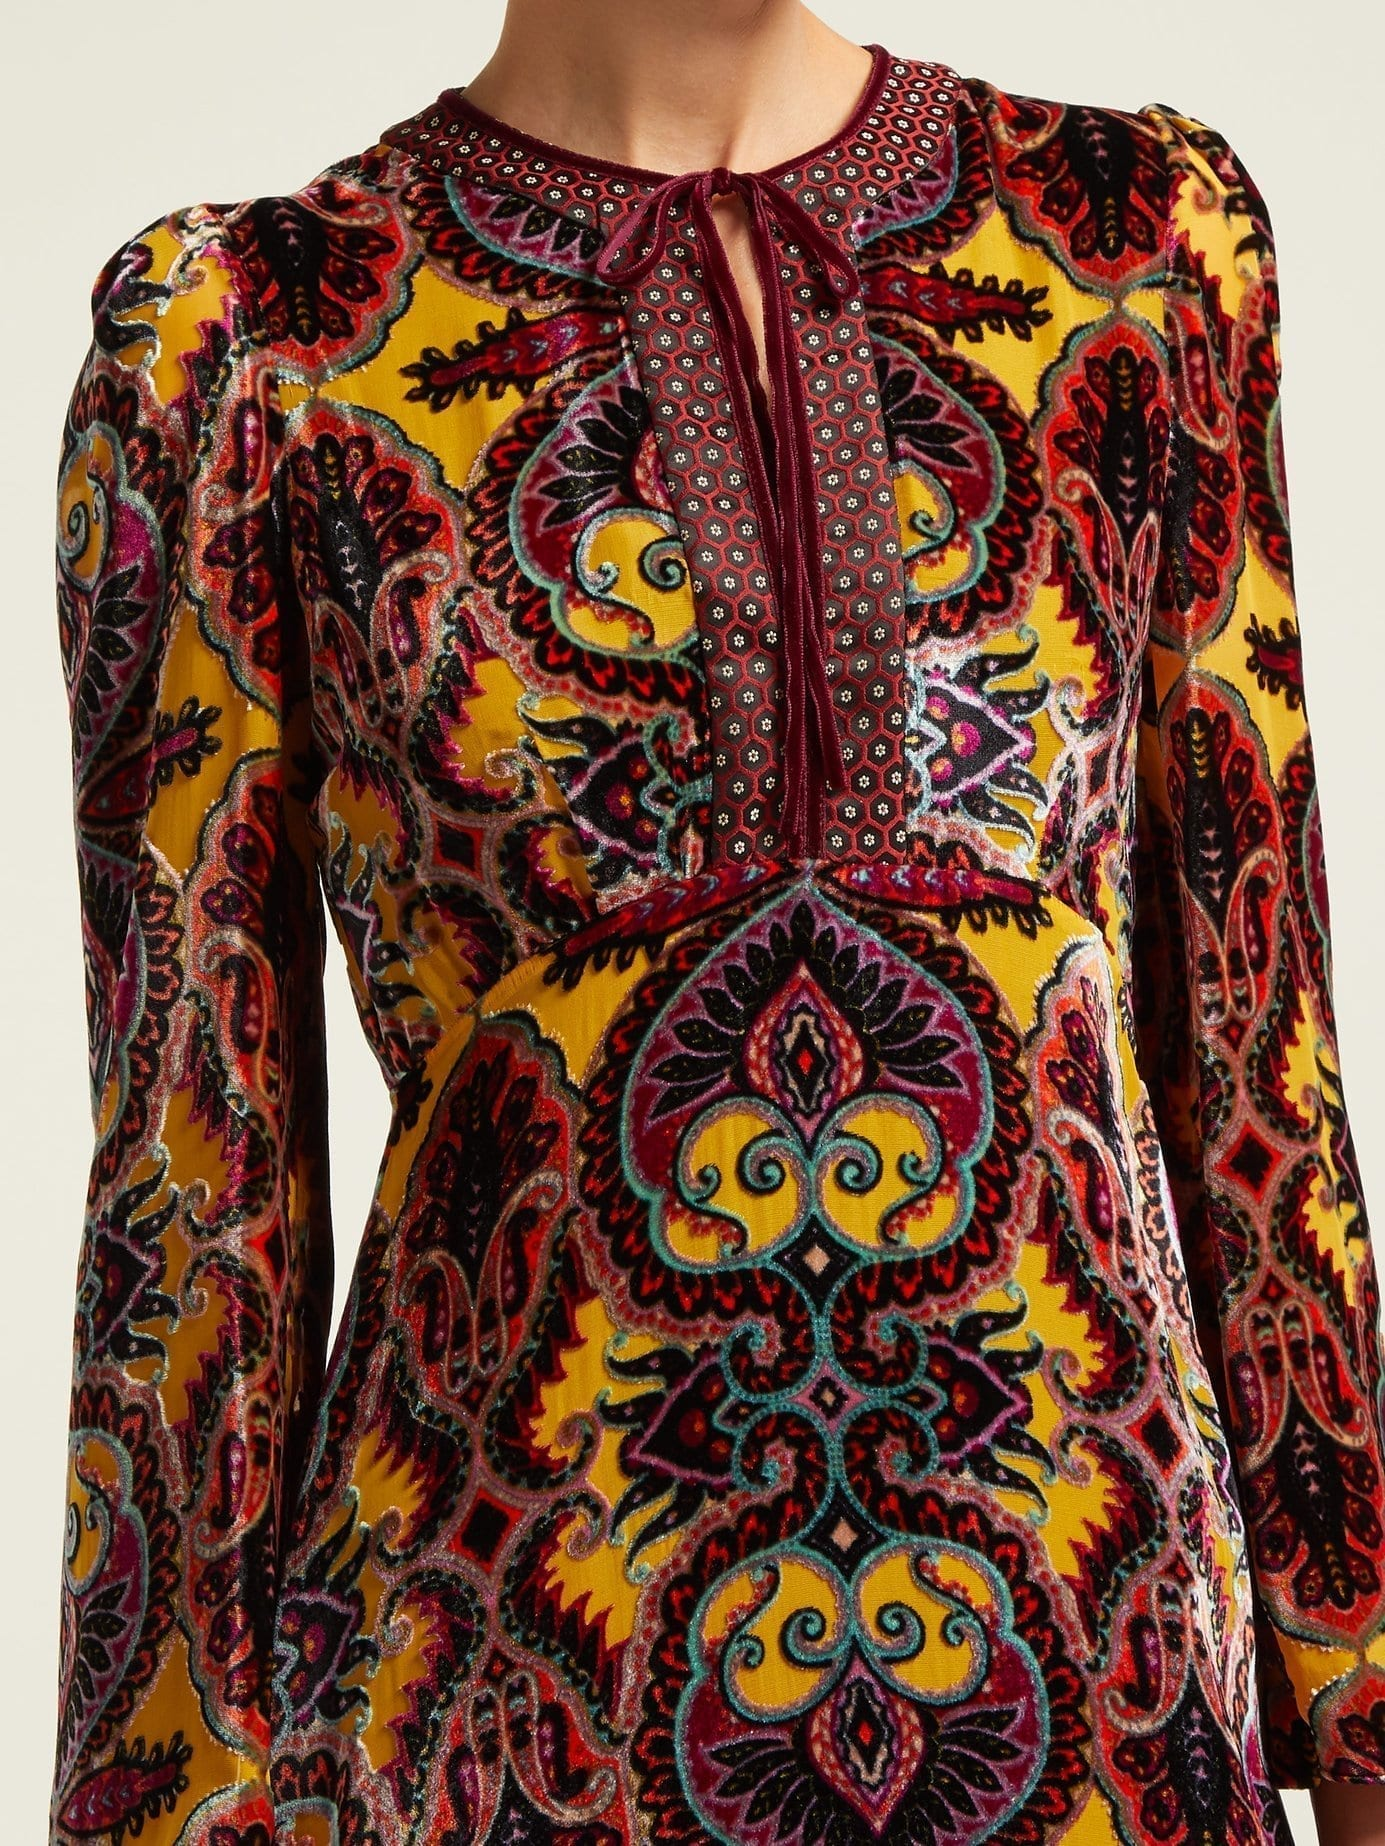 10b0a3eaab4 ETRO Paisley Devoré Velvet Midi Yellow Dress - We Select Dresses